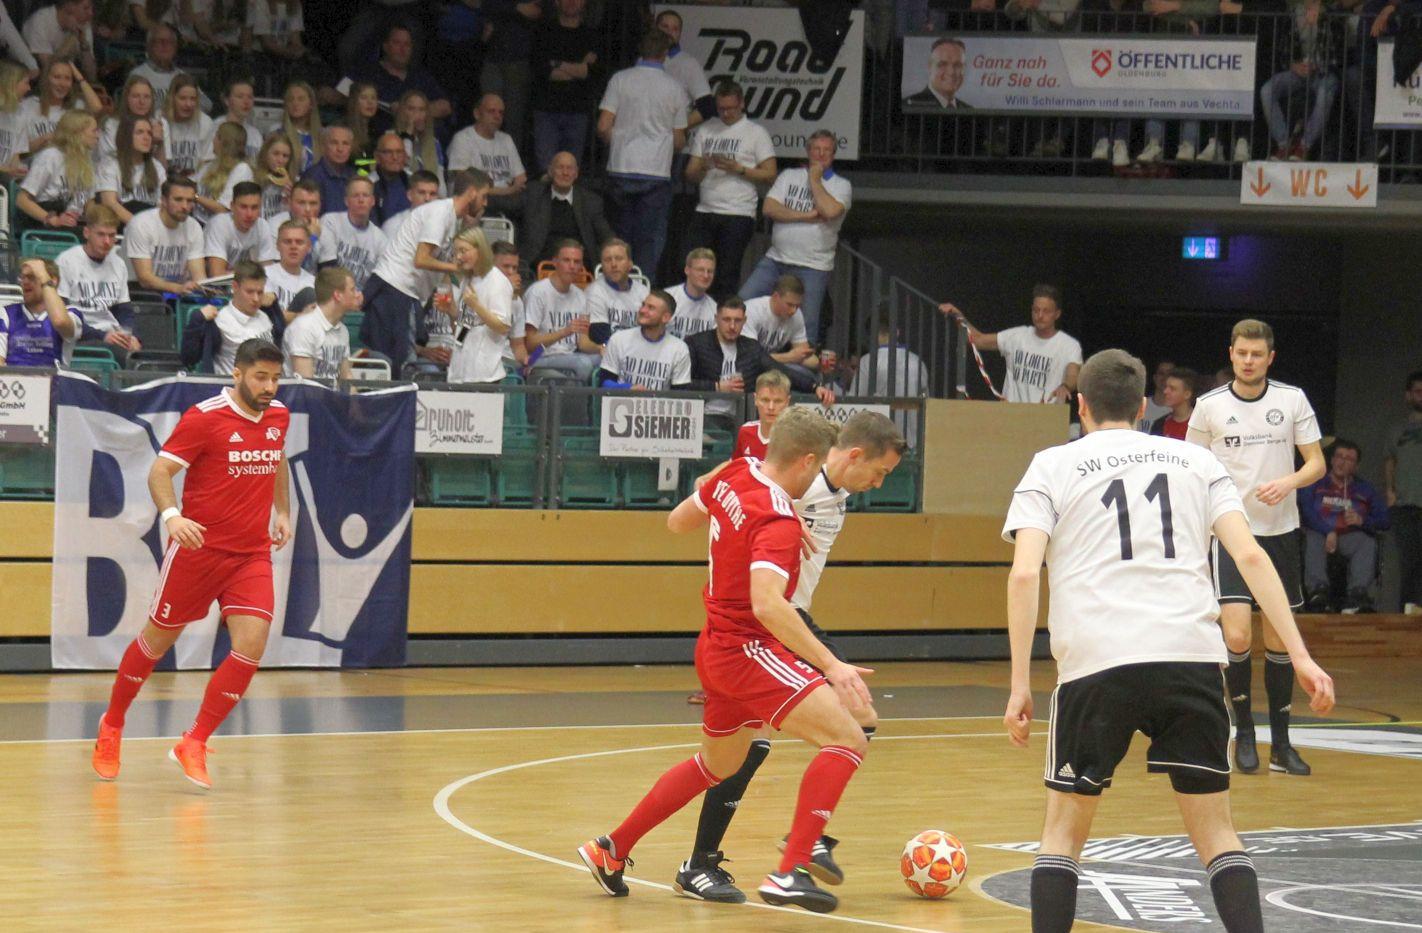 OV-Supercup-201219-008.jpg